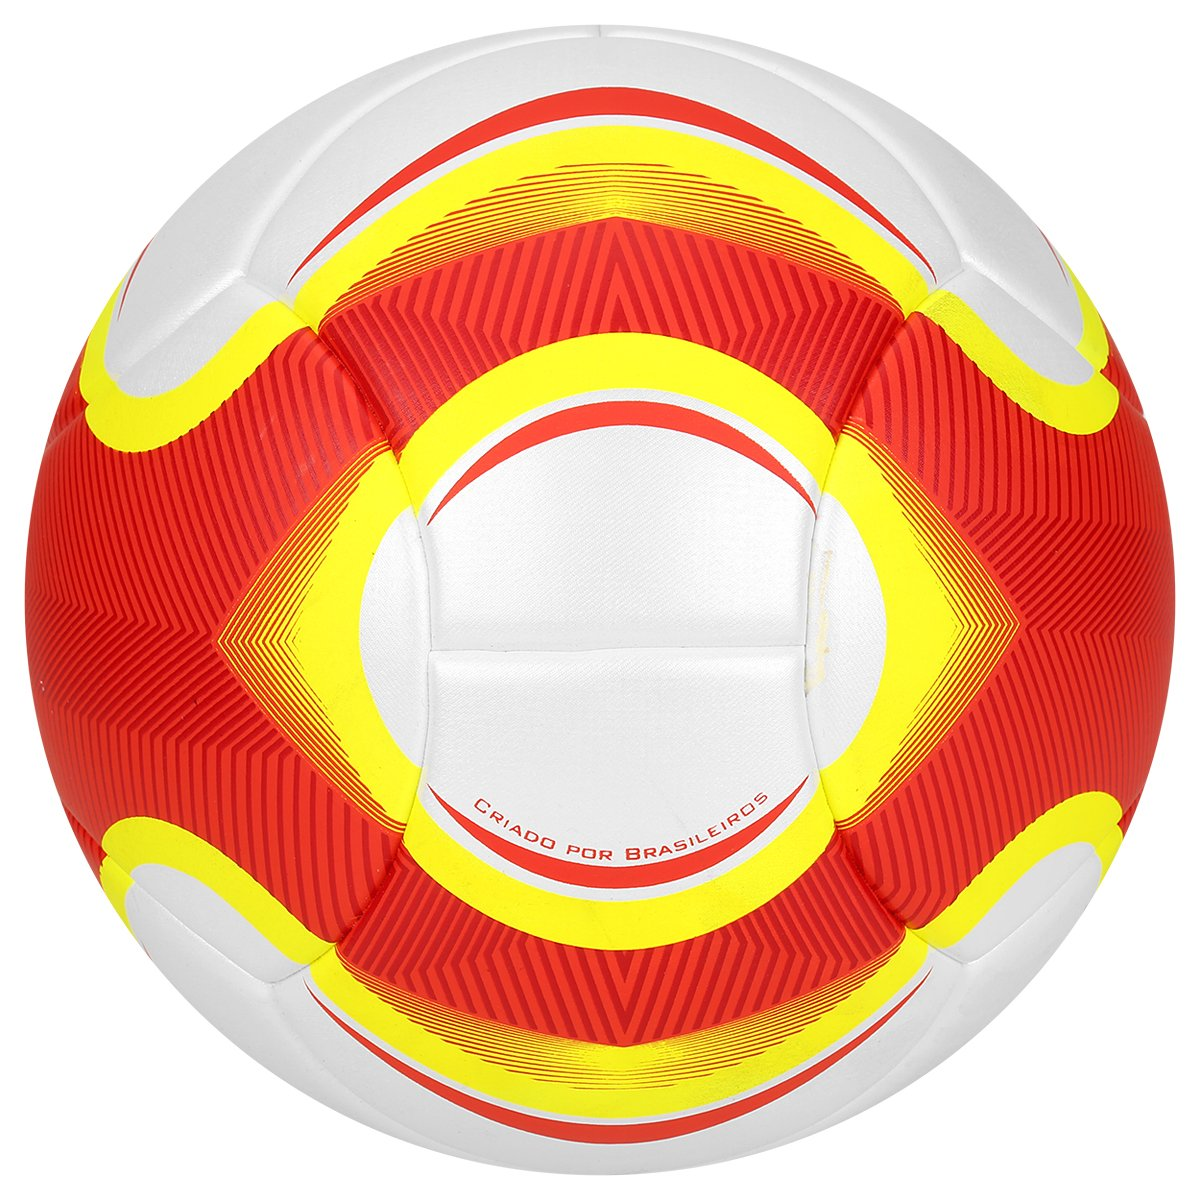 Bola Futebol Campo Penalty S11 R3 Ultra Fusion VI - Compre Agora ... aab1139cbf1be